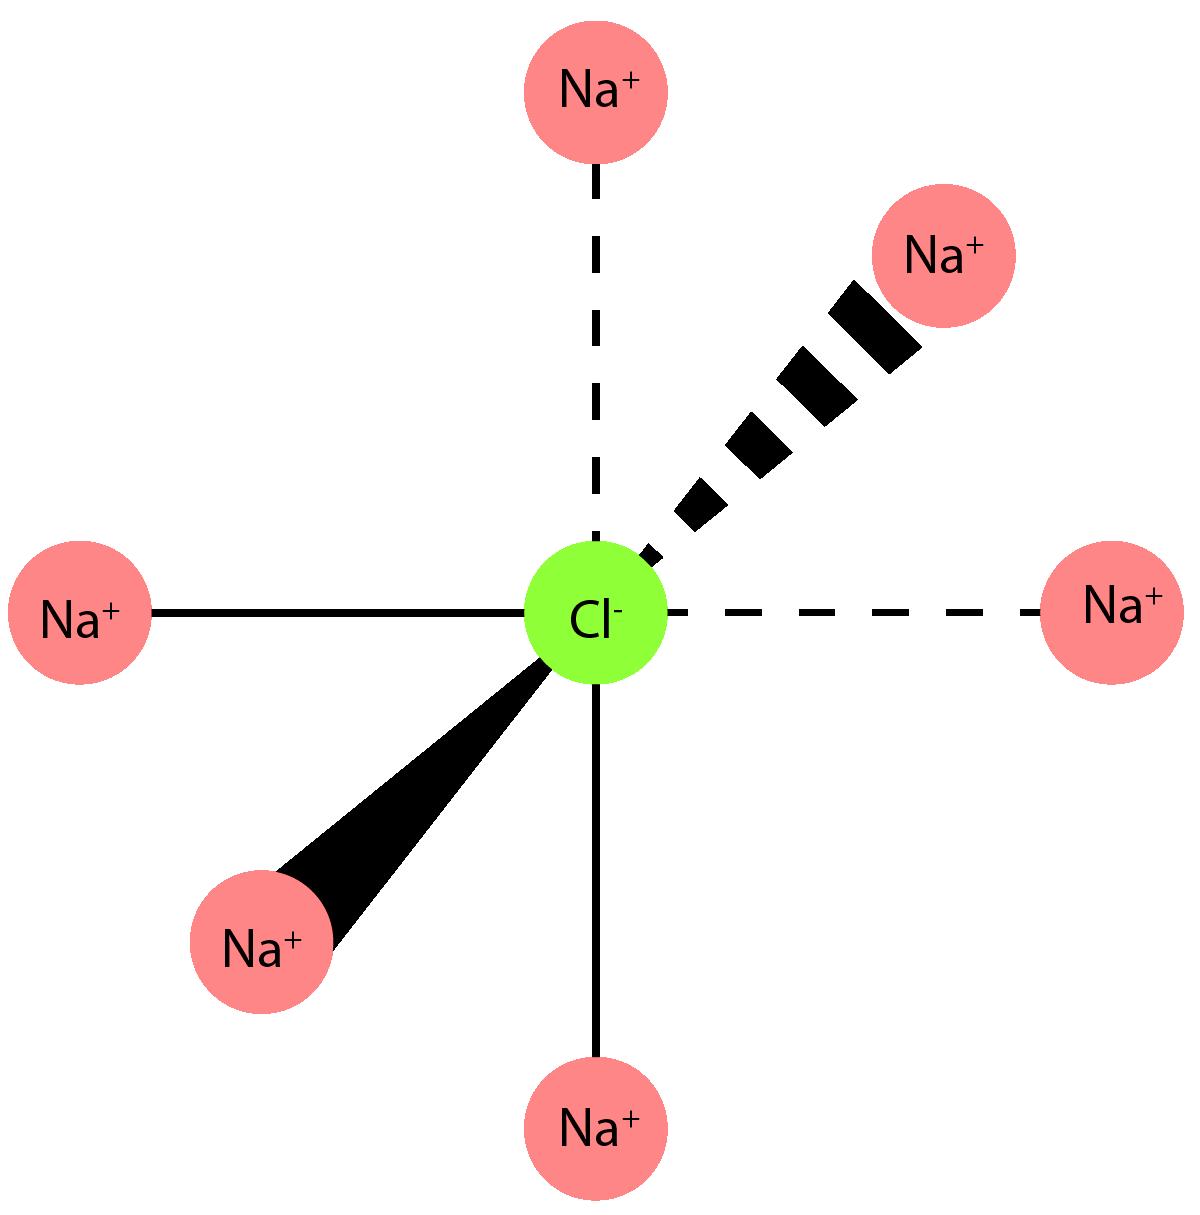 кристалл хлорида натрия